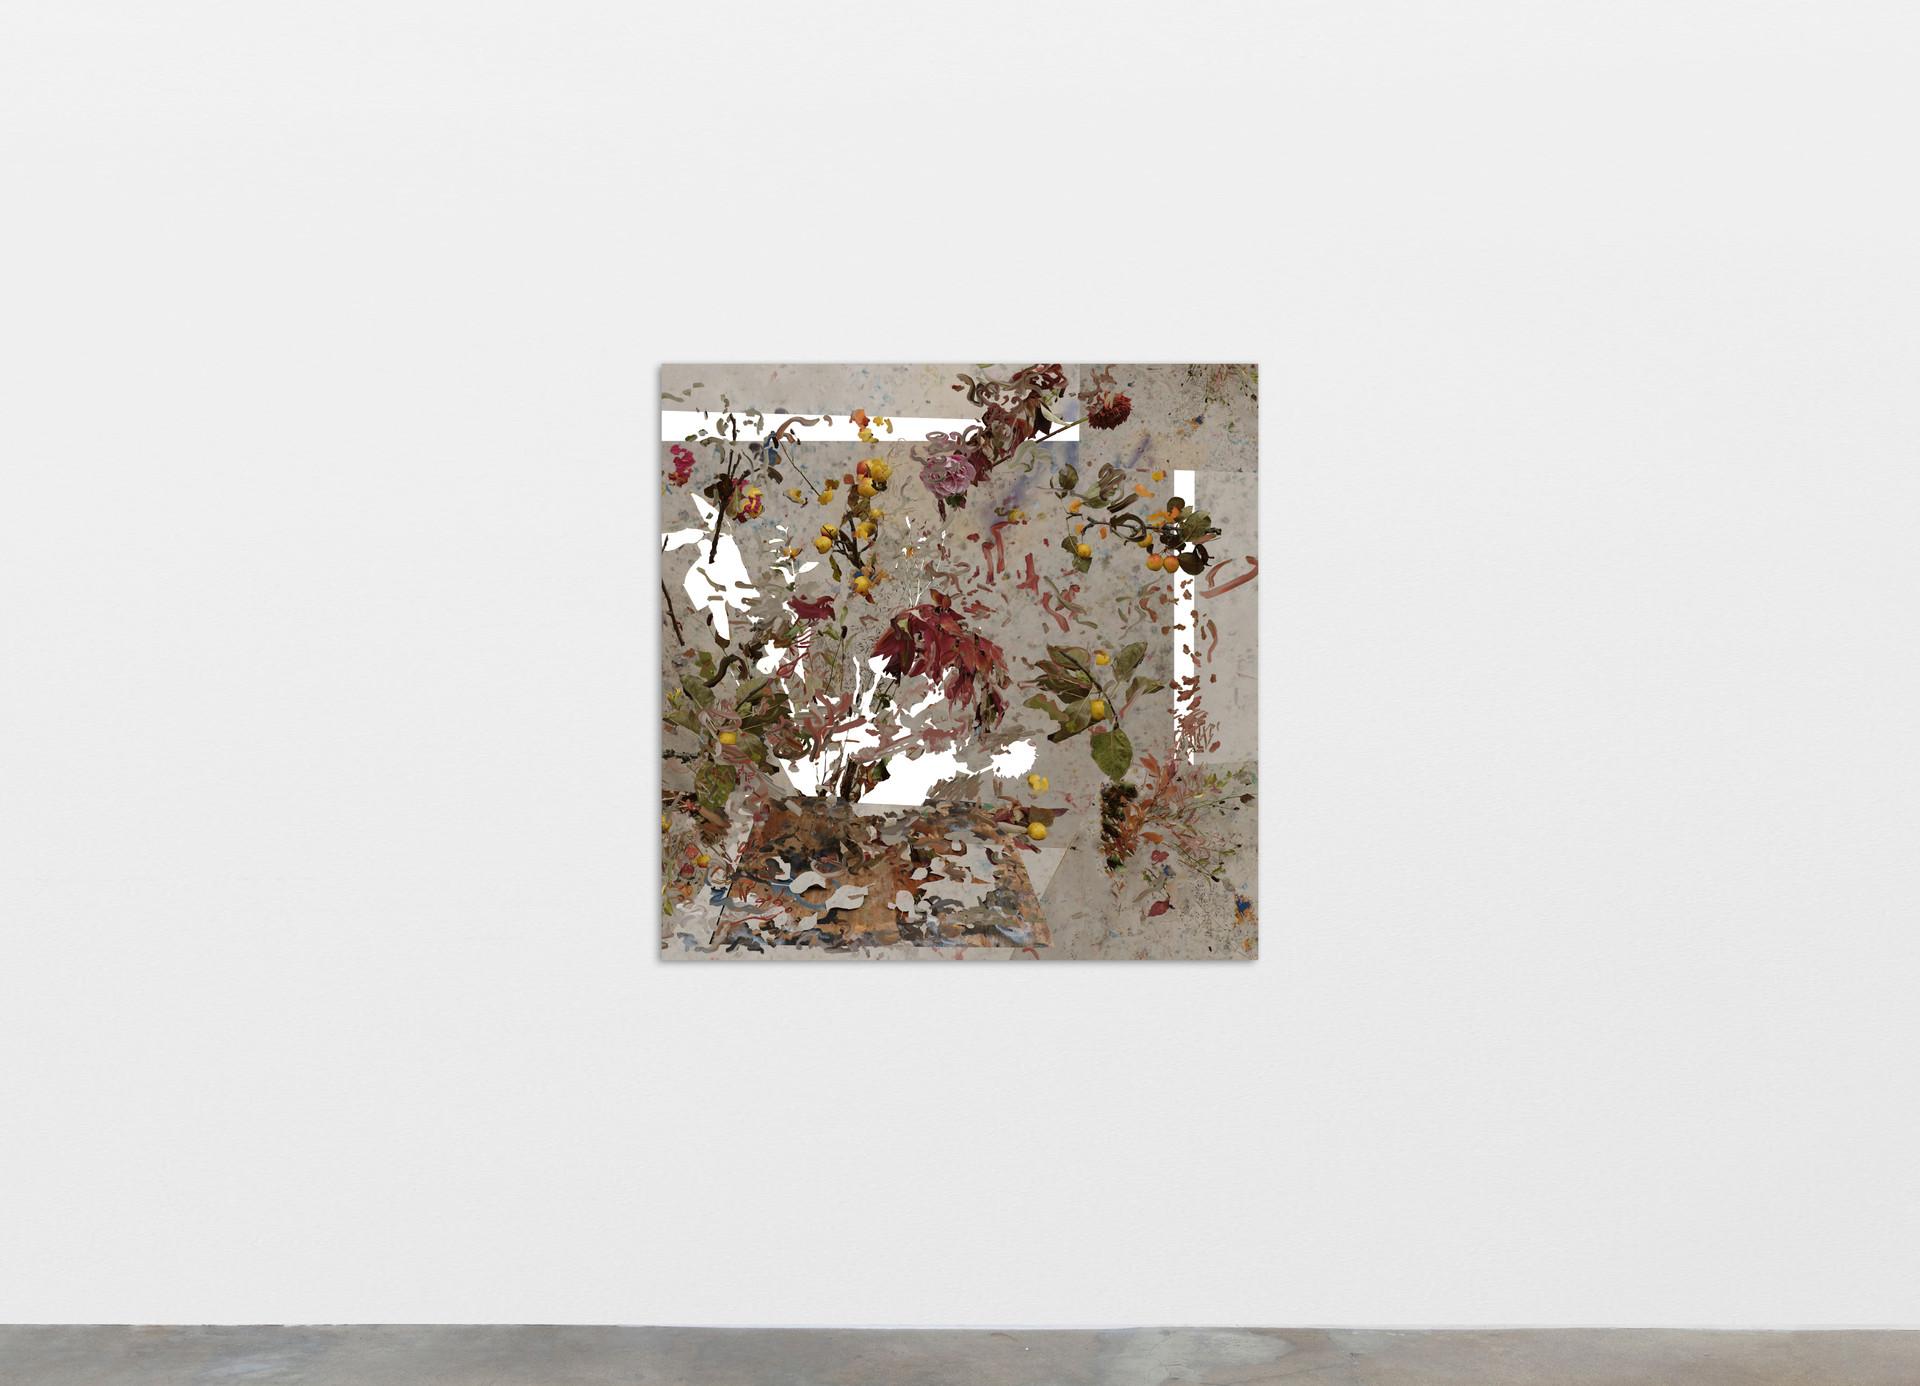 Petra Cortright autek_cerchiamo concessionari_children-eating, 2020 Digital painting on anodized aluminum 83.82 x 83.82 cm 33 x 33 in